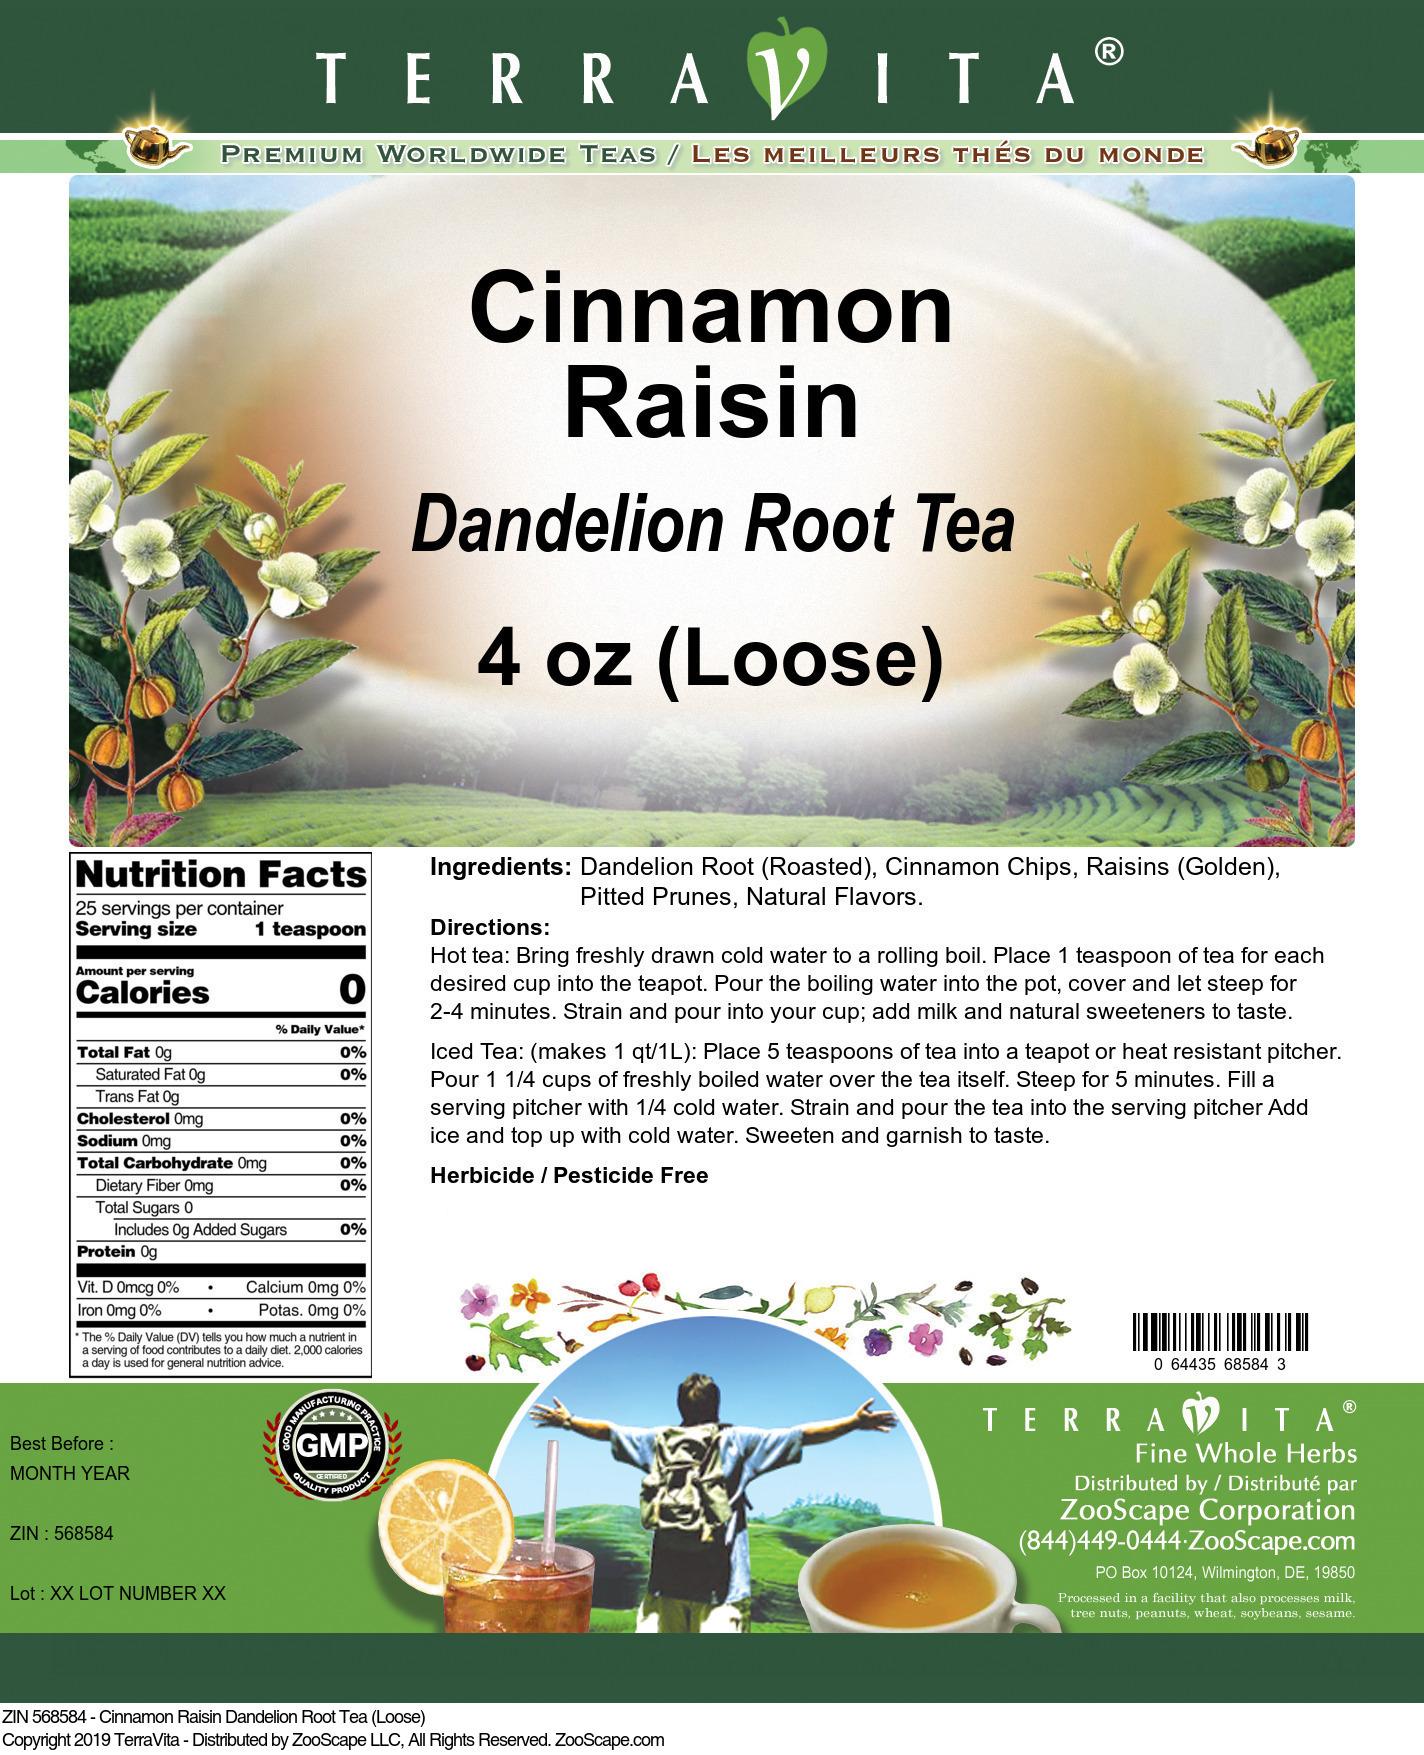 Cinnamon Raisin Dandelion Root